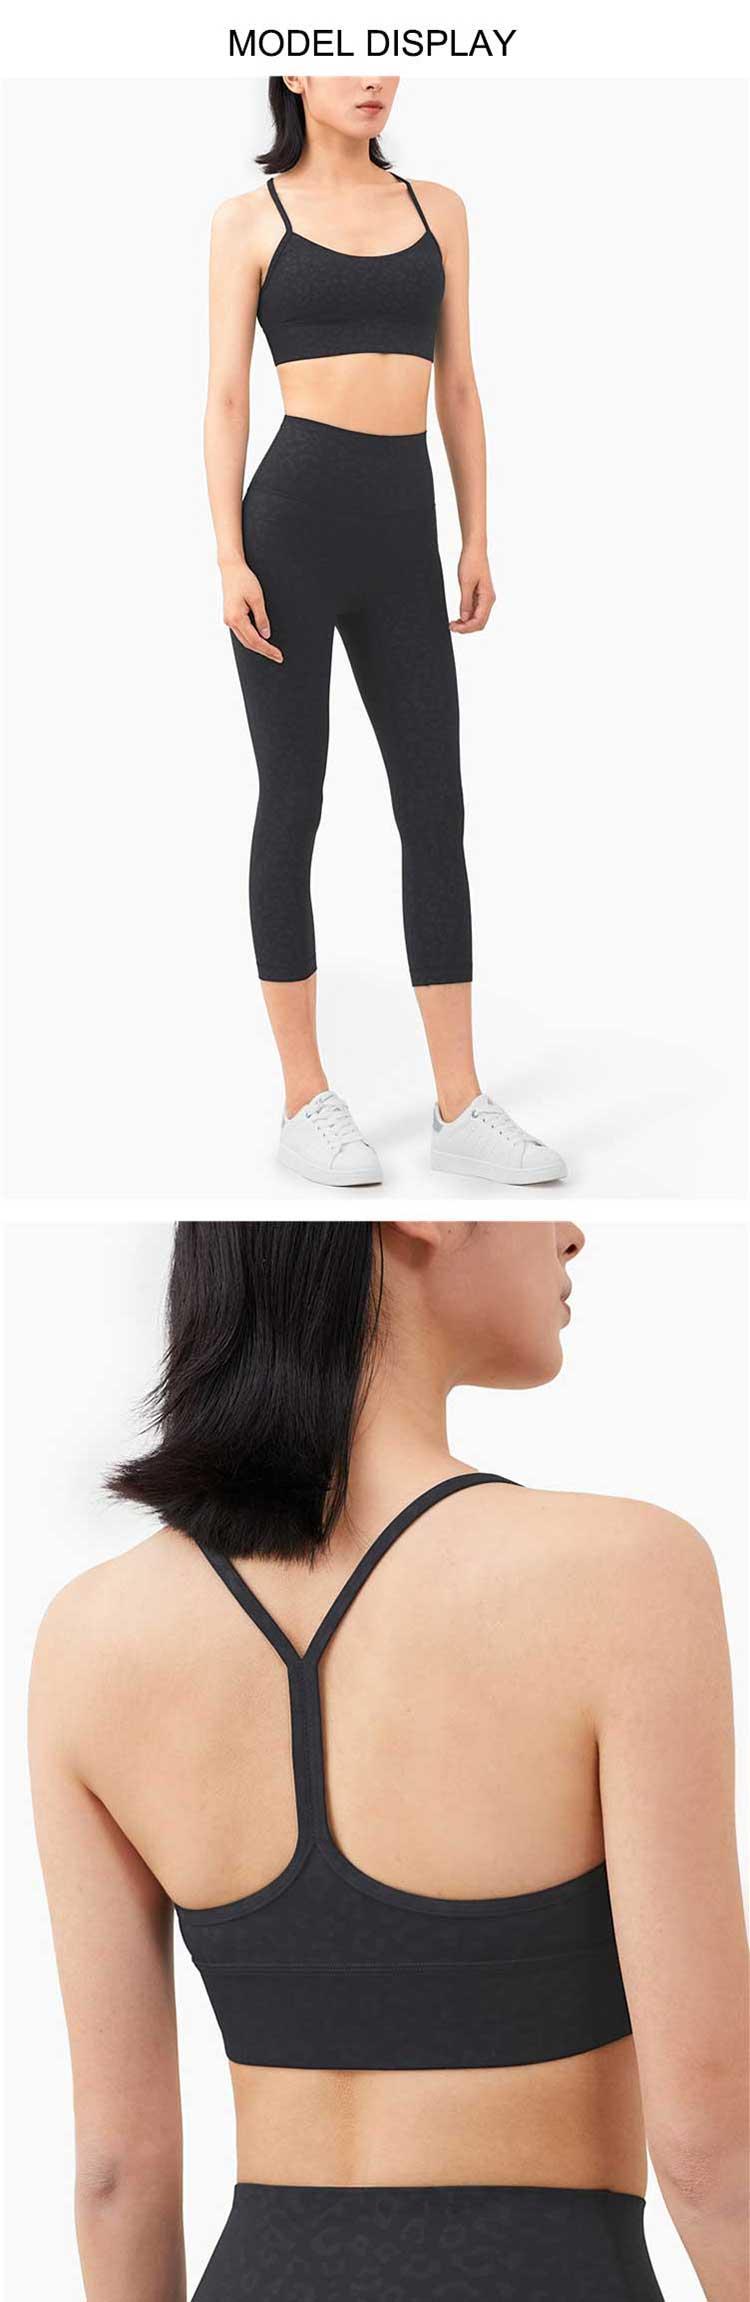 The-design-of-underwear-must-not